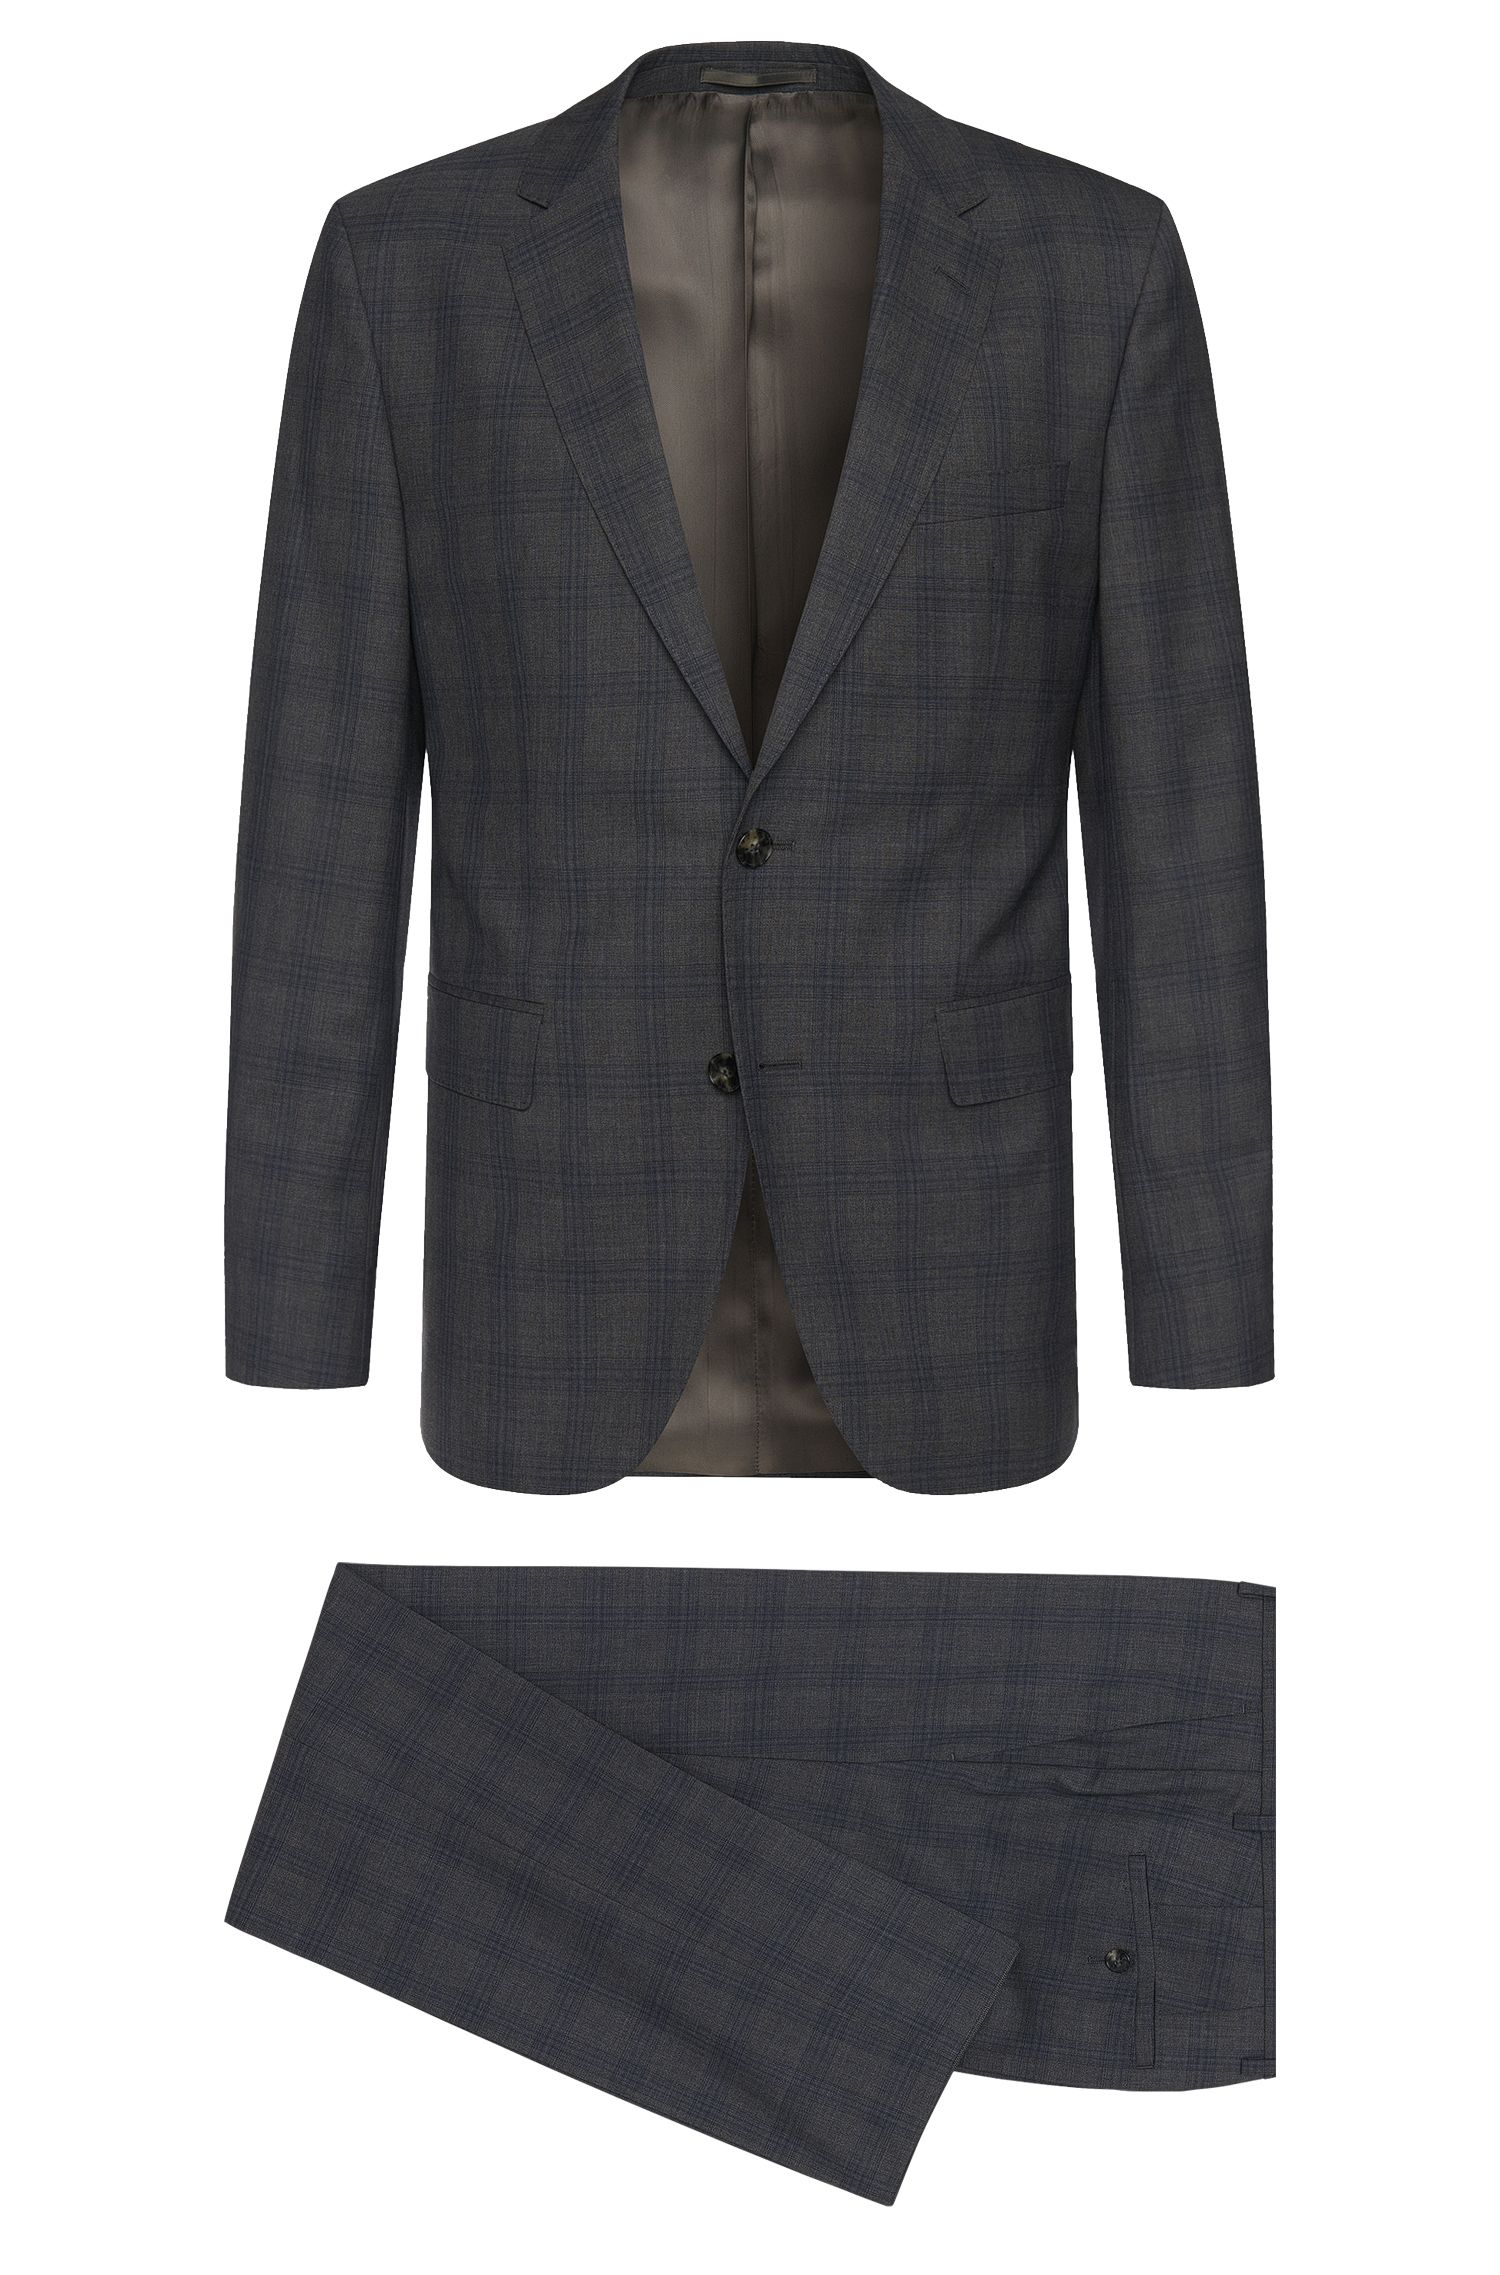 'Johnstons/Lenon' | Regular Fit, Super 100 Virgin Wool Suit